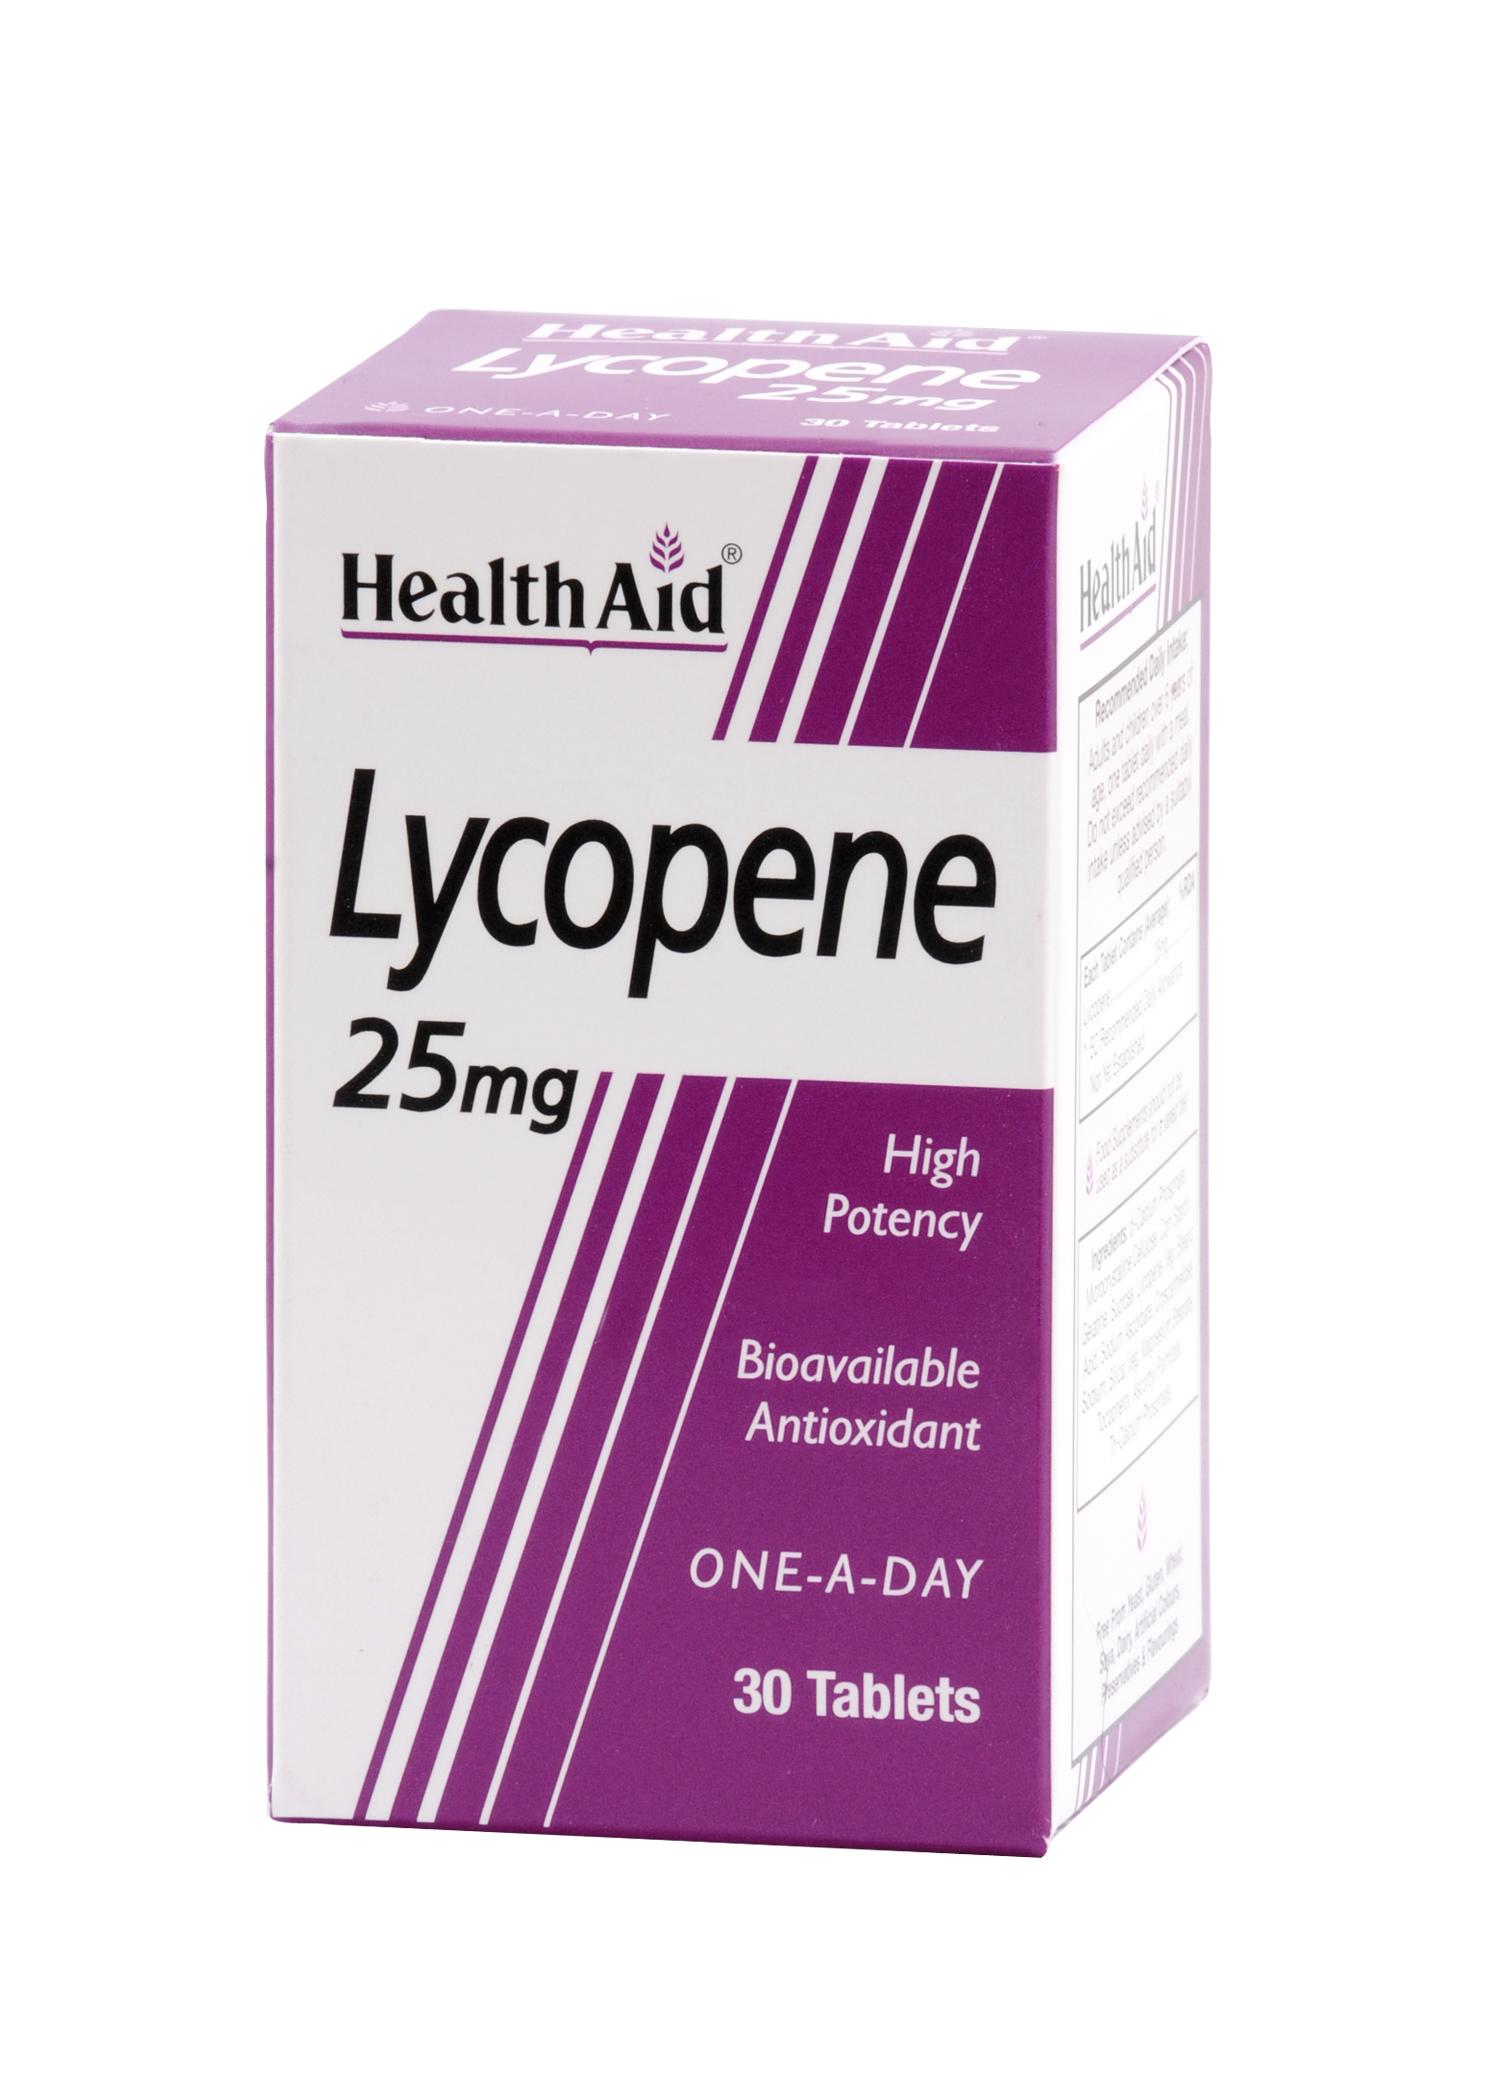 Health Aid Lycopene 25 mg Καροτινοειδές Με Ισχυρή Αντιοξειδωτική Δράση 30tabs